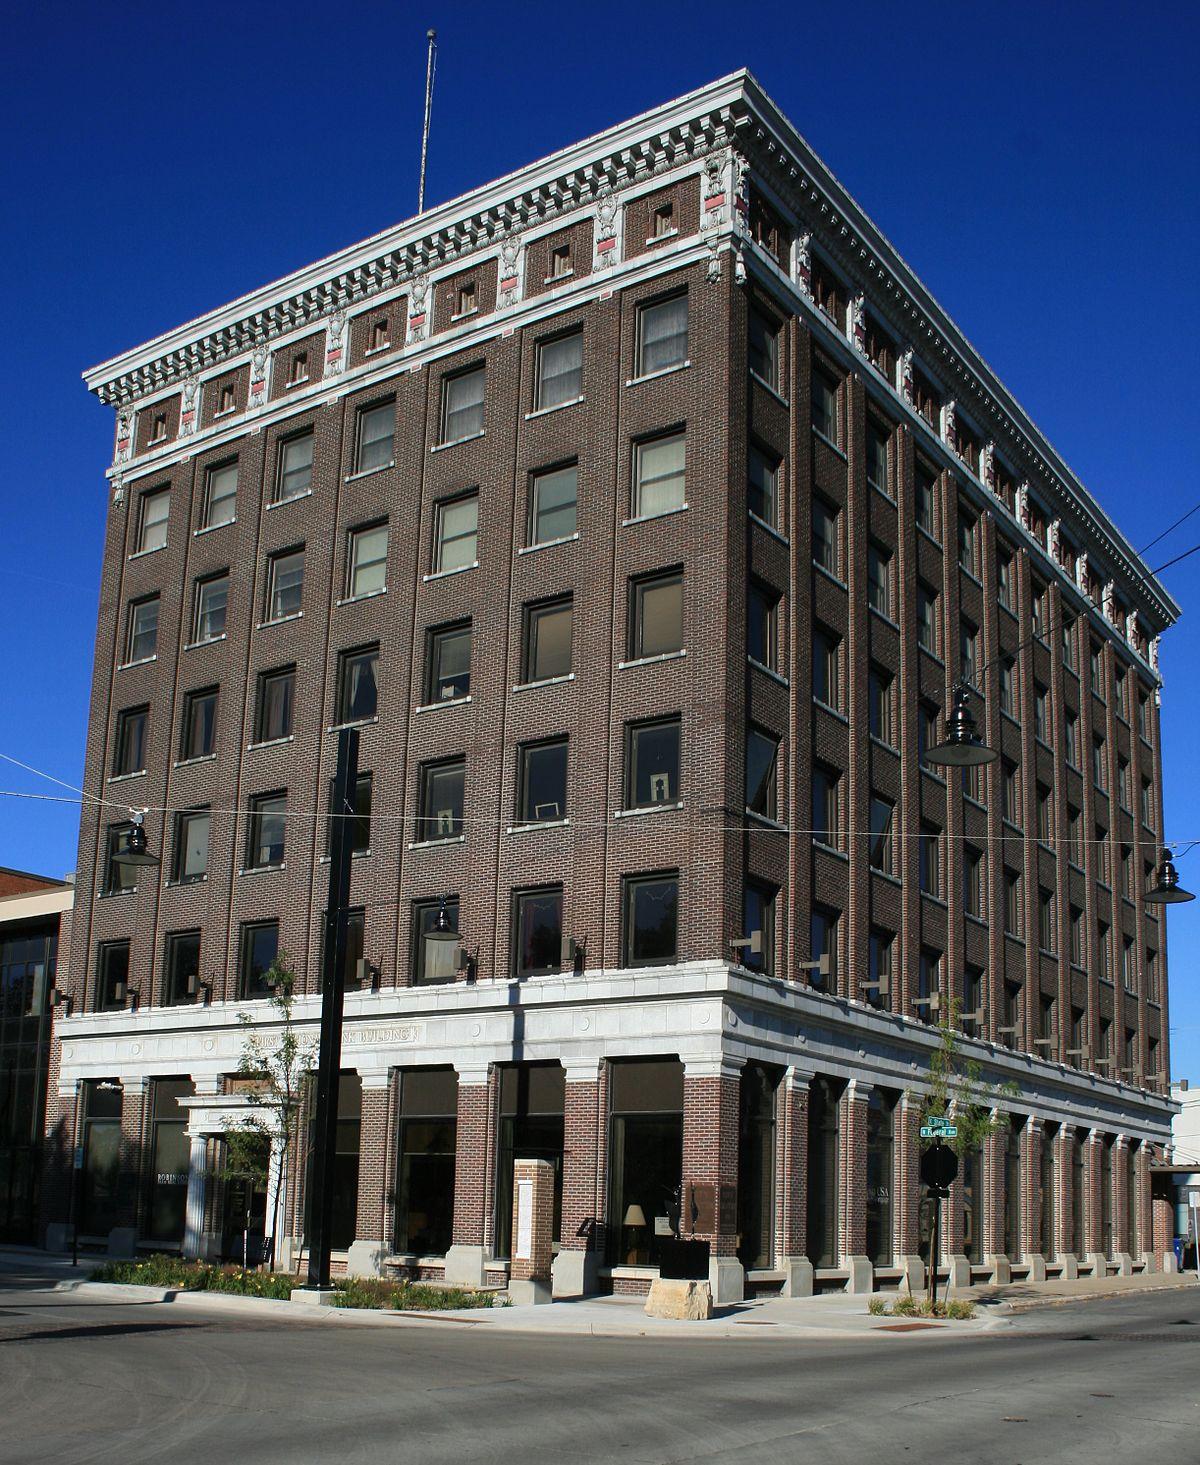 Apartments Iowa City: First National Bank Of Mason City